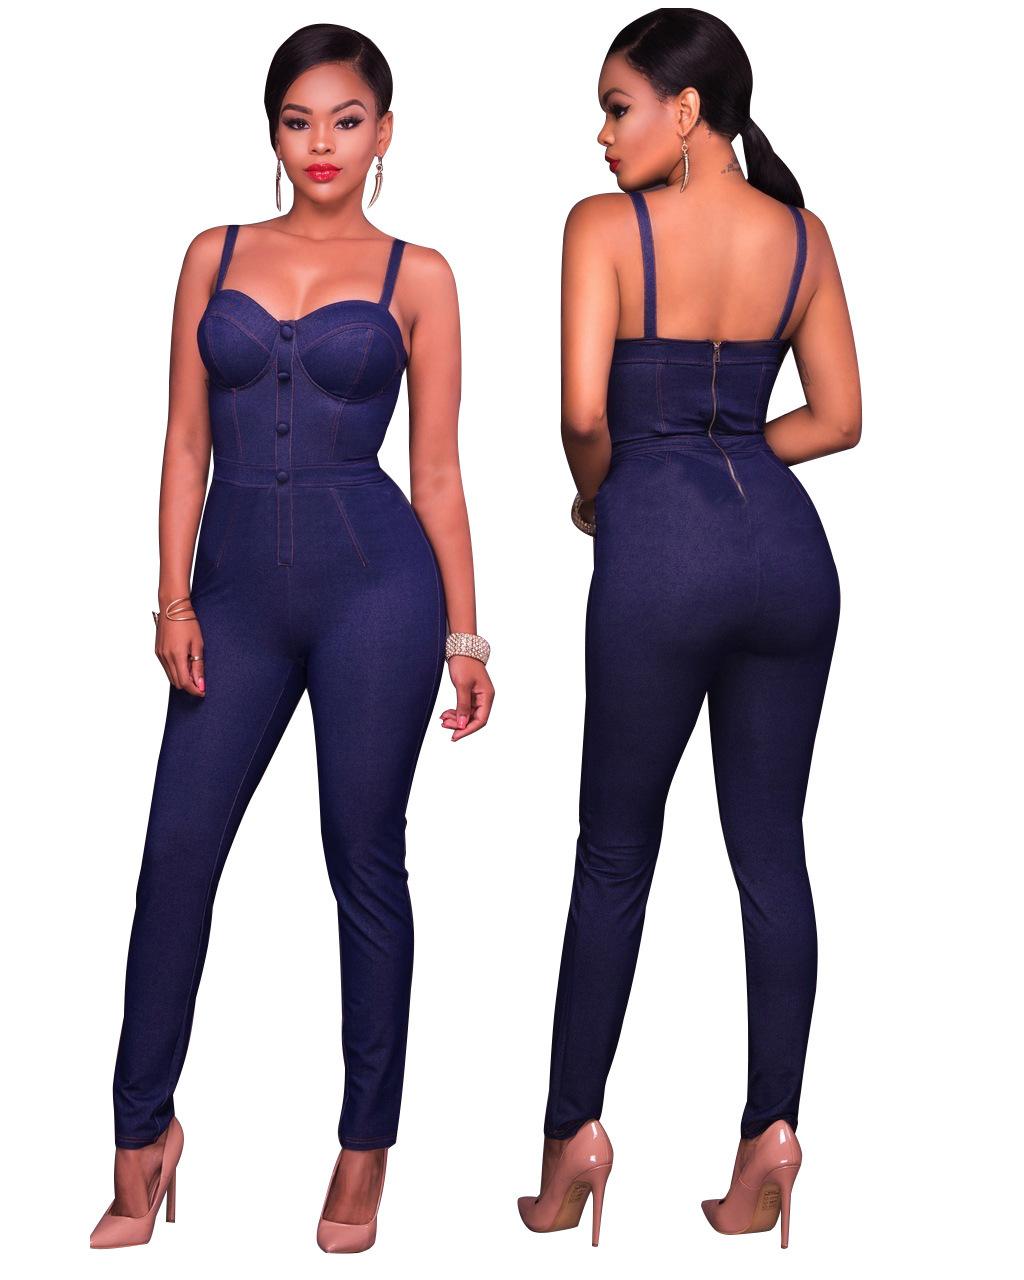 Slinkey purple blue strappy denim jumpsuit 25743 25743 1